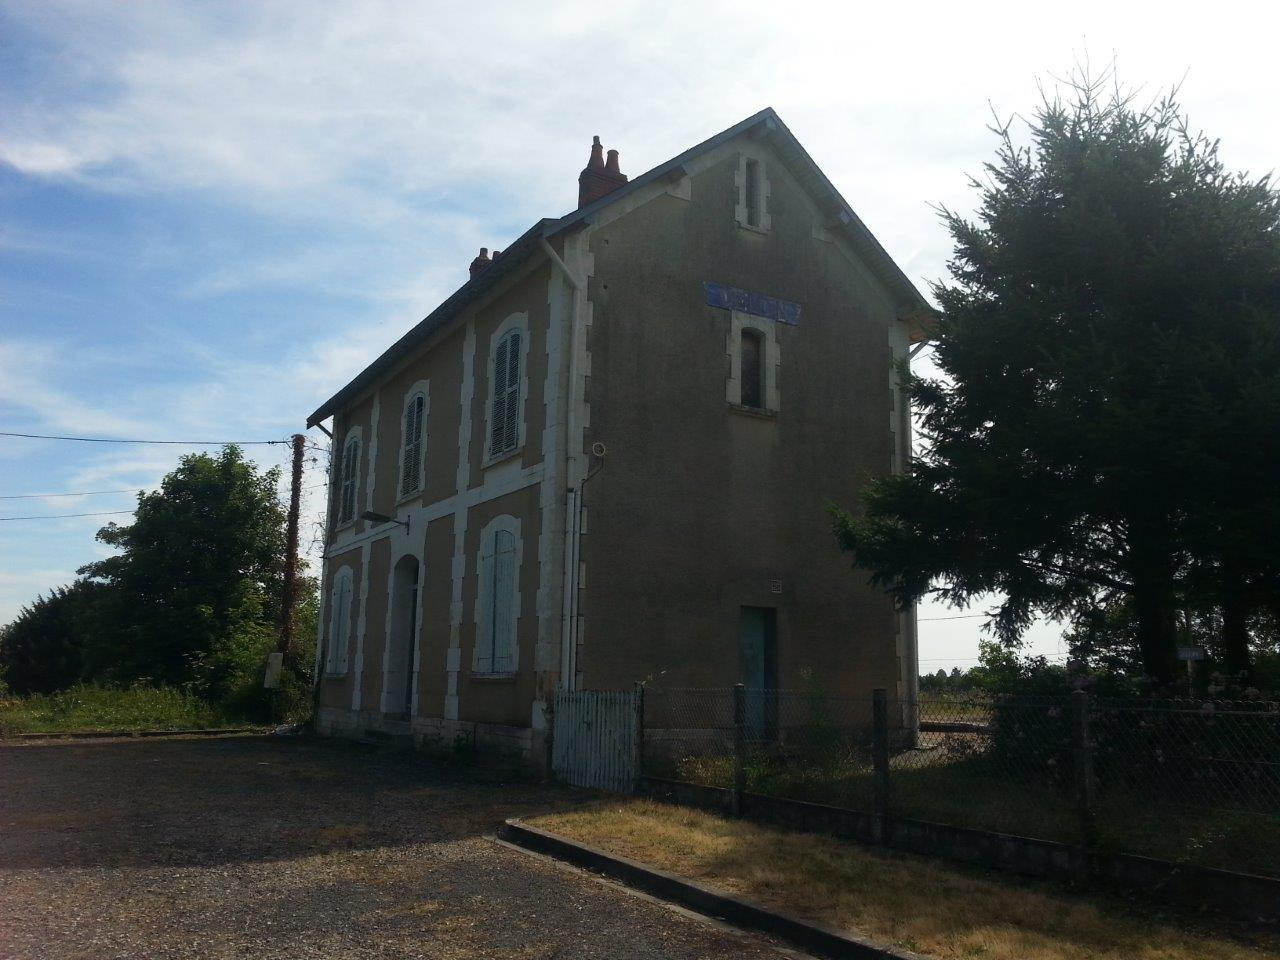 gare-de-celon-train-station